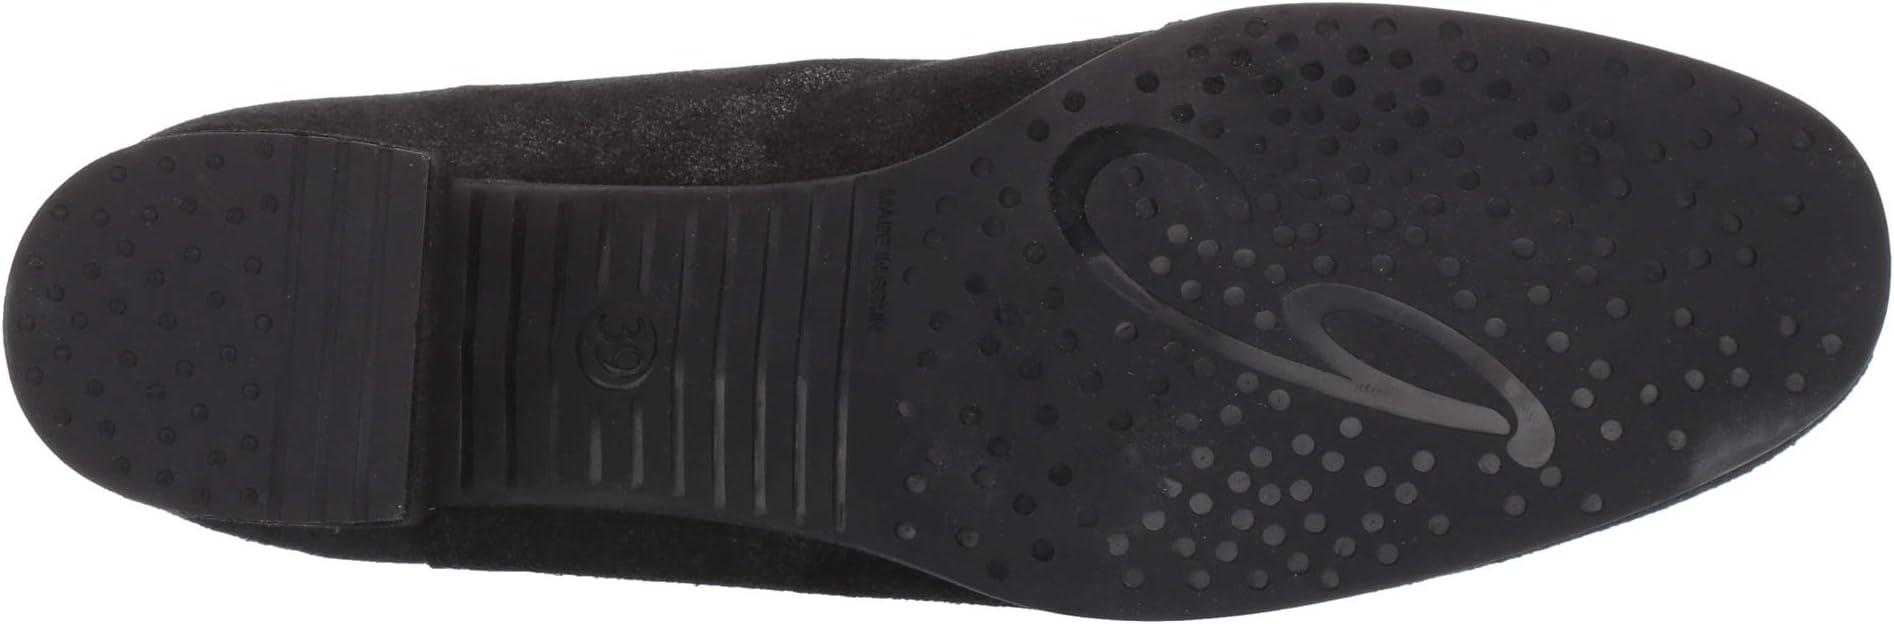 Eric Michael Freida   Women's shoes   2020 Newest